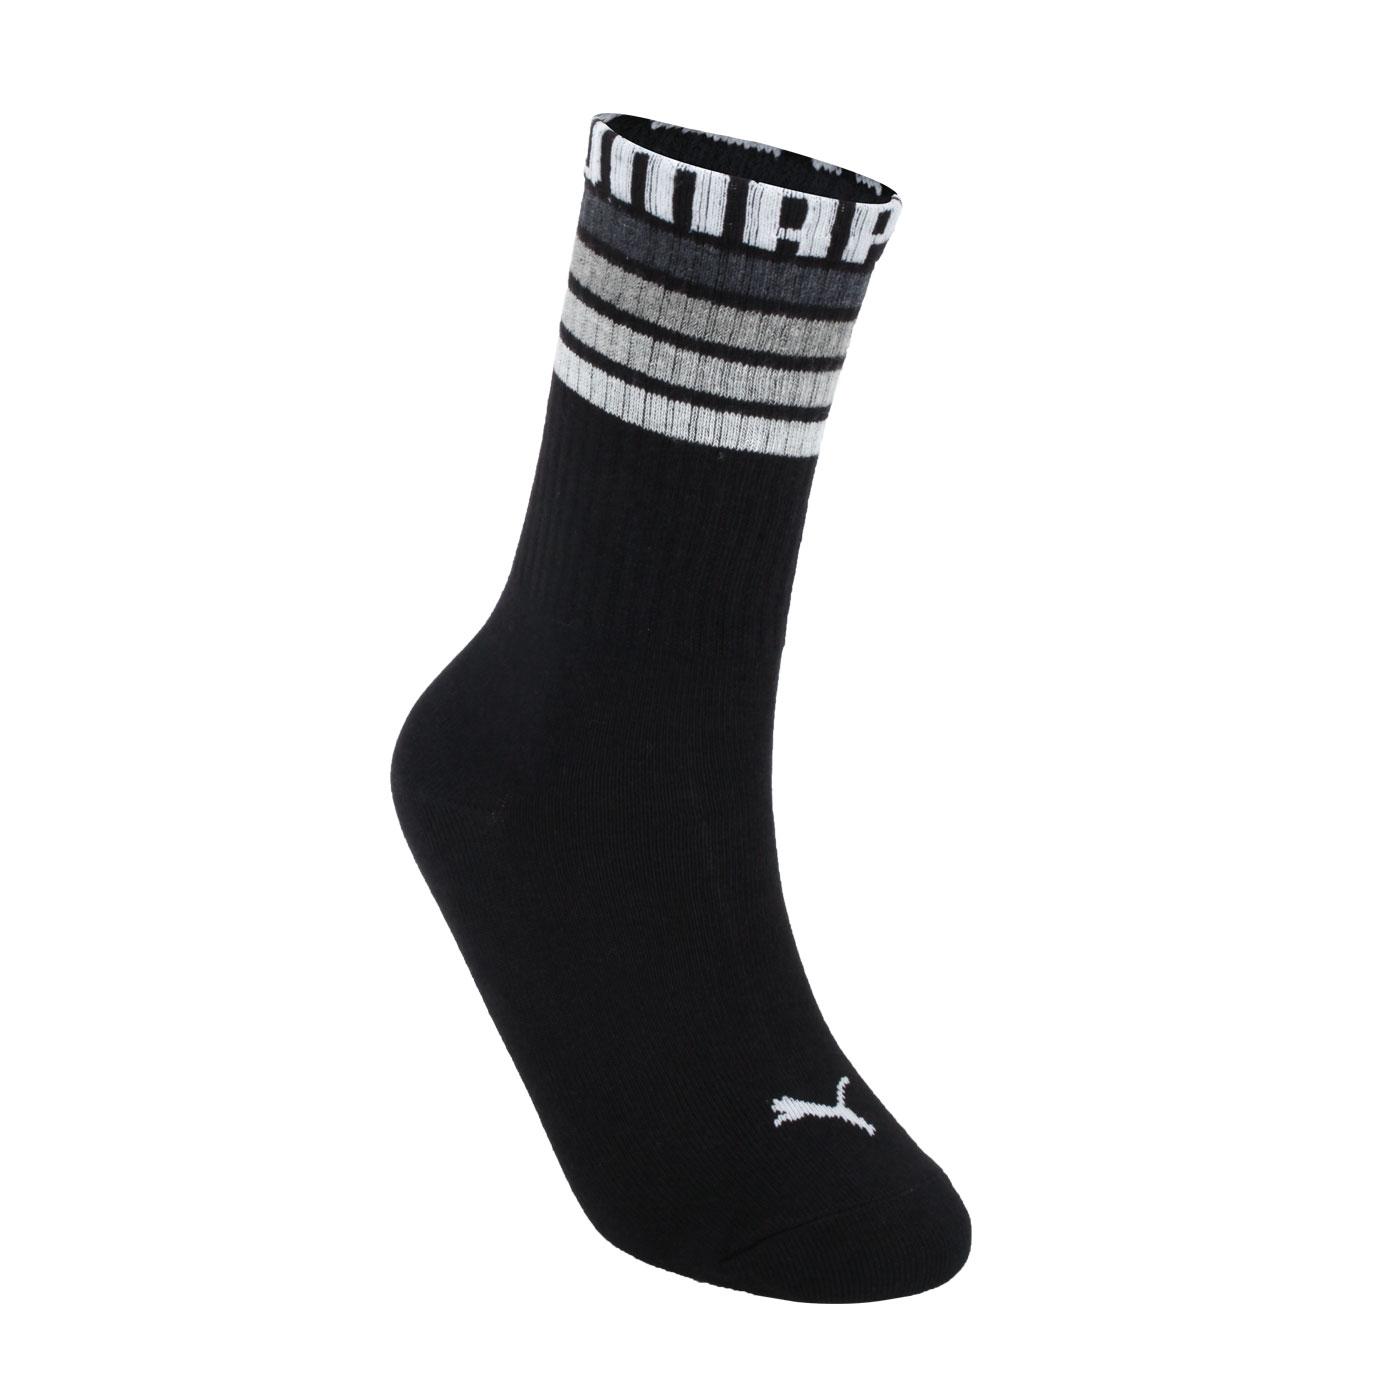 PUMA  字樣長襪 BB128301 - 黑白灰